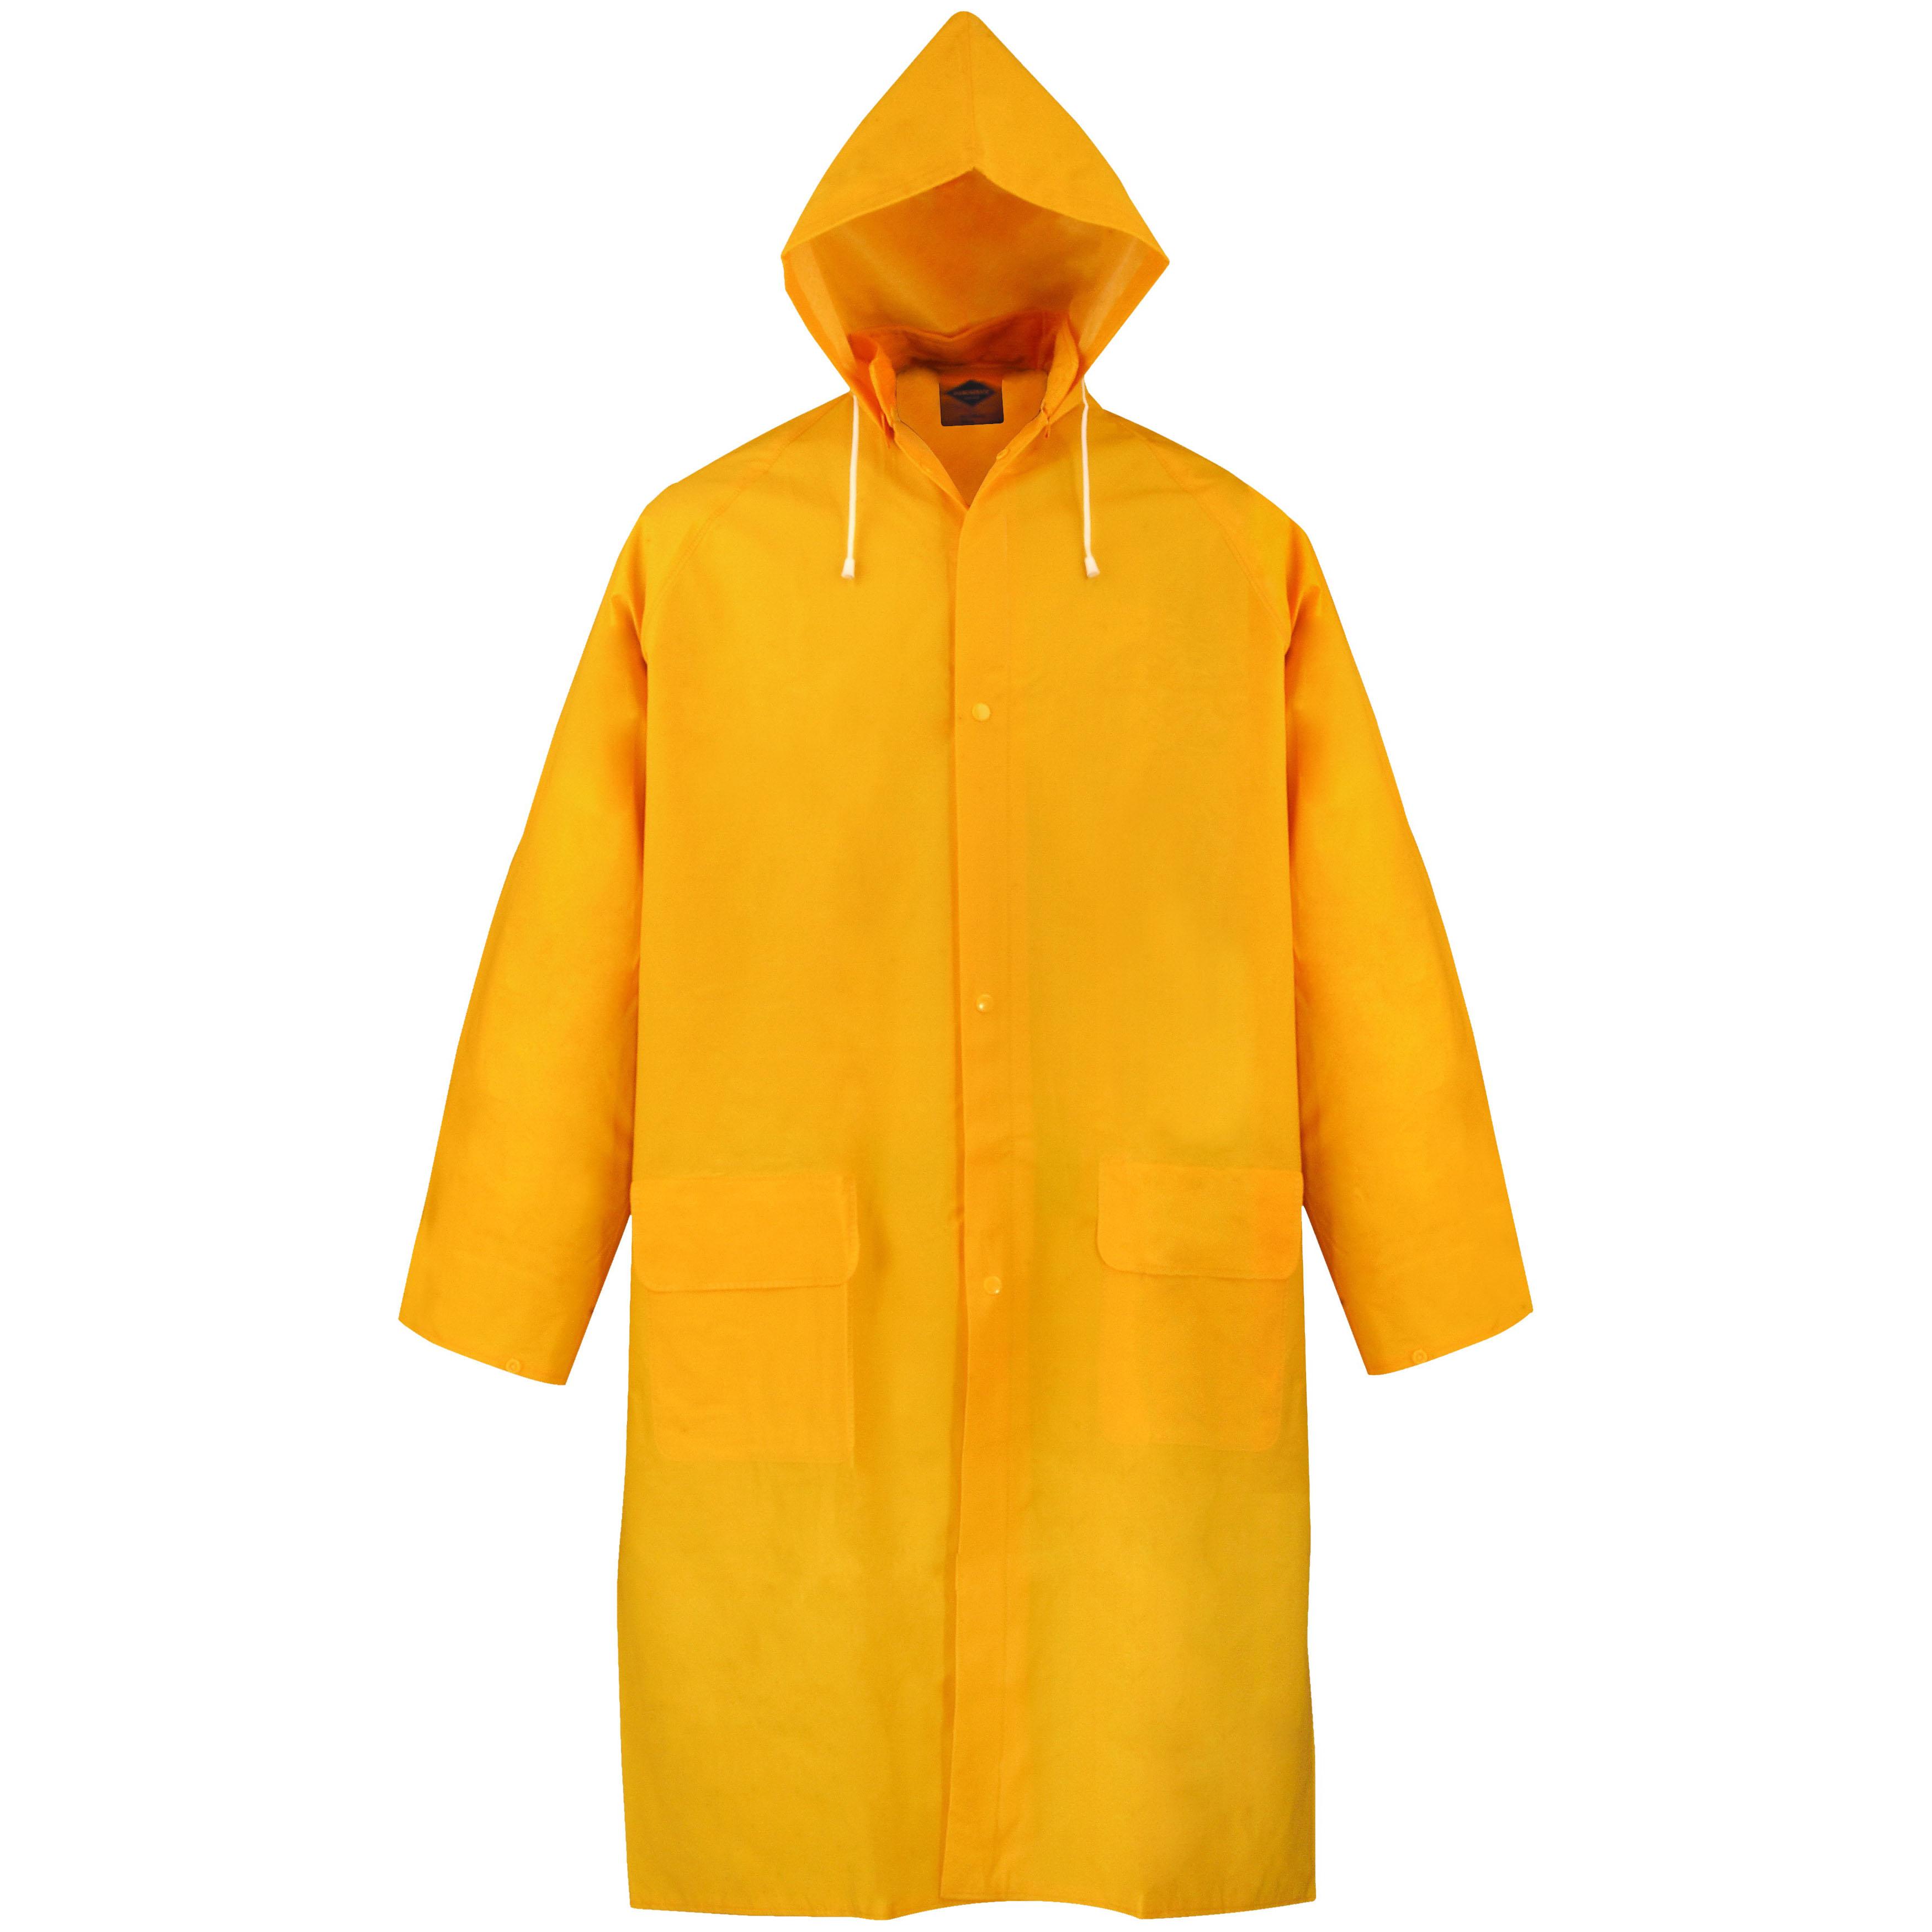 Picture of Diamondback PY-800XXL Raincoat, 2XL, Polyester/PVC, Yellow, Removable Collar